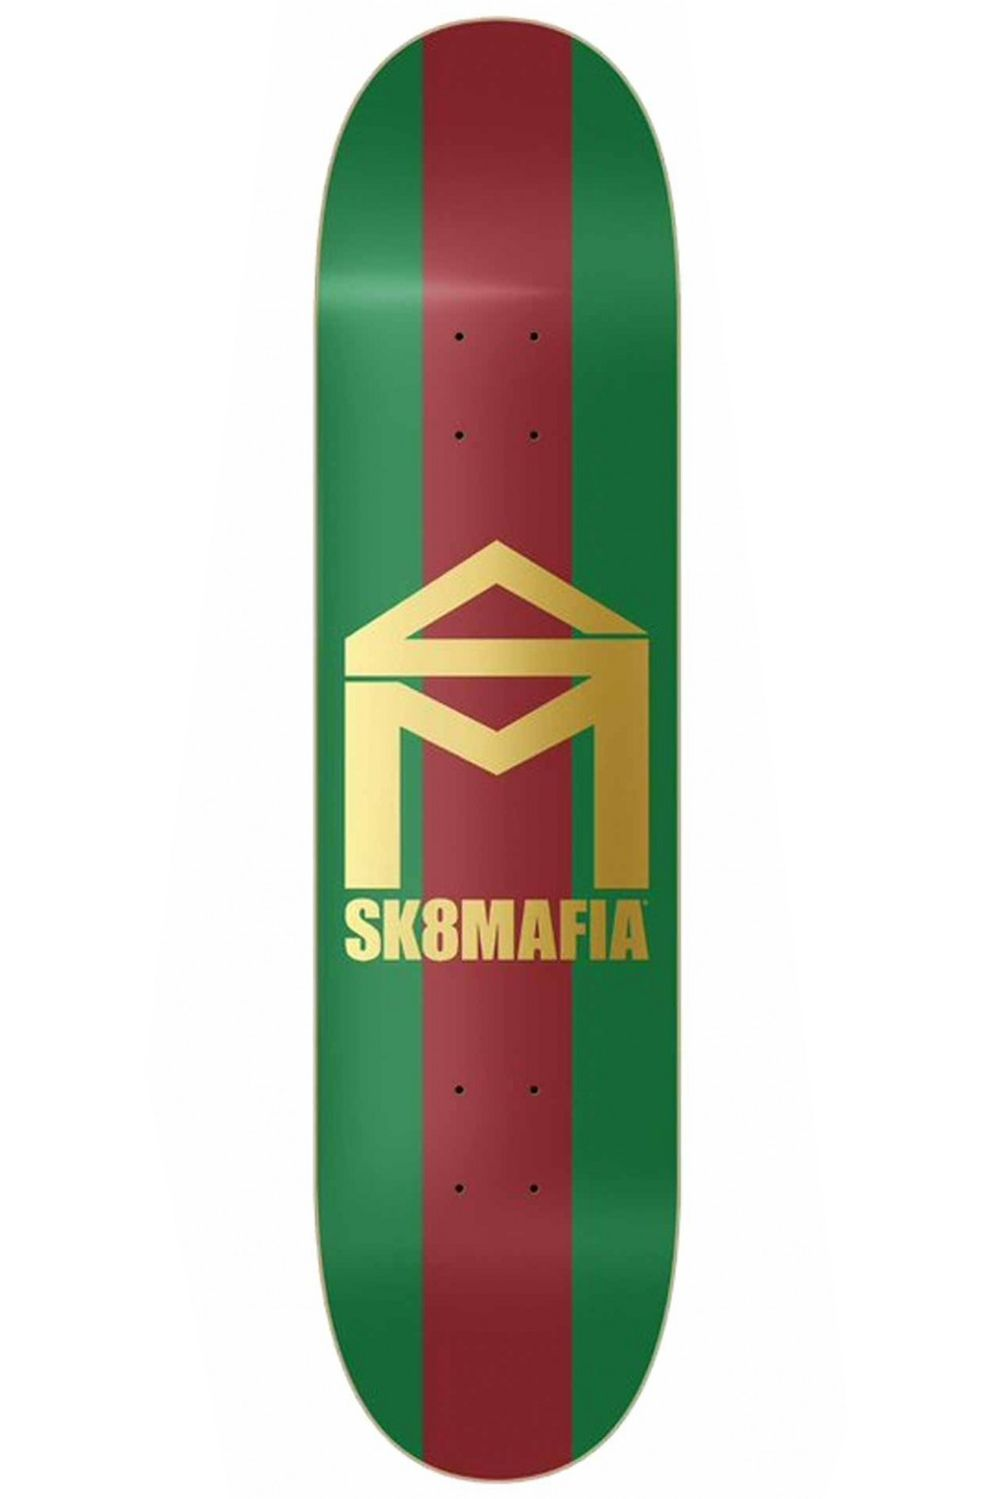 "Sk8Mafia Skate Board HOUSE LOGO GG 8.25"" X 32"" Assorted"